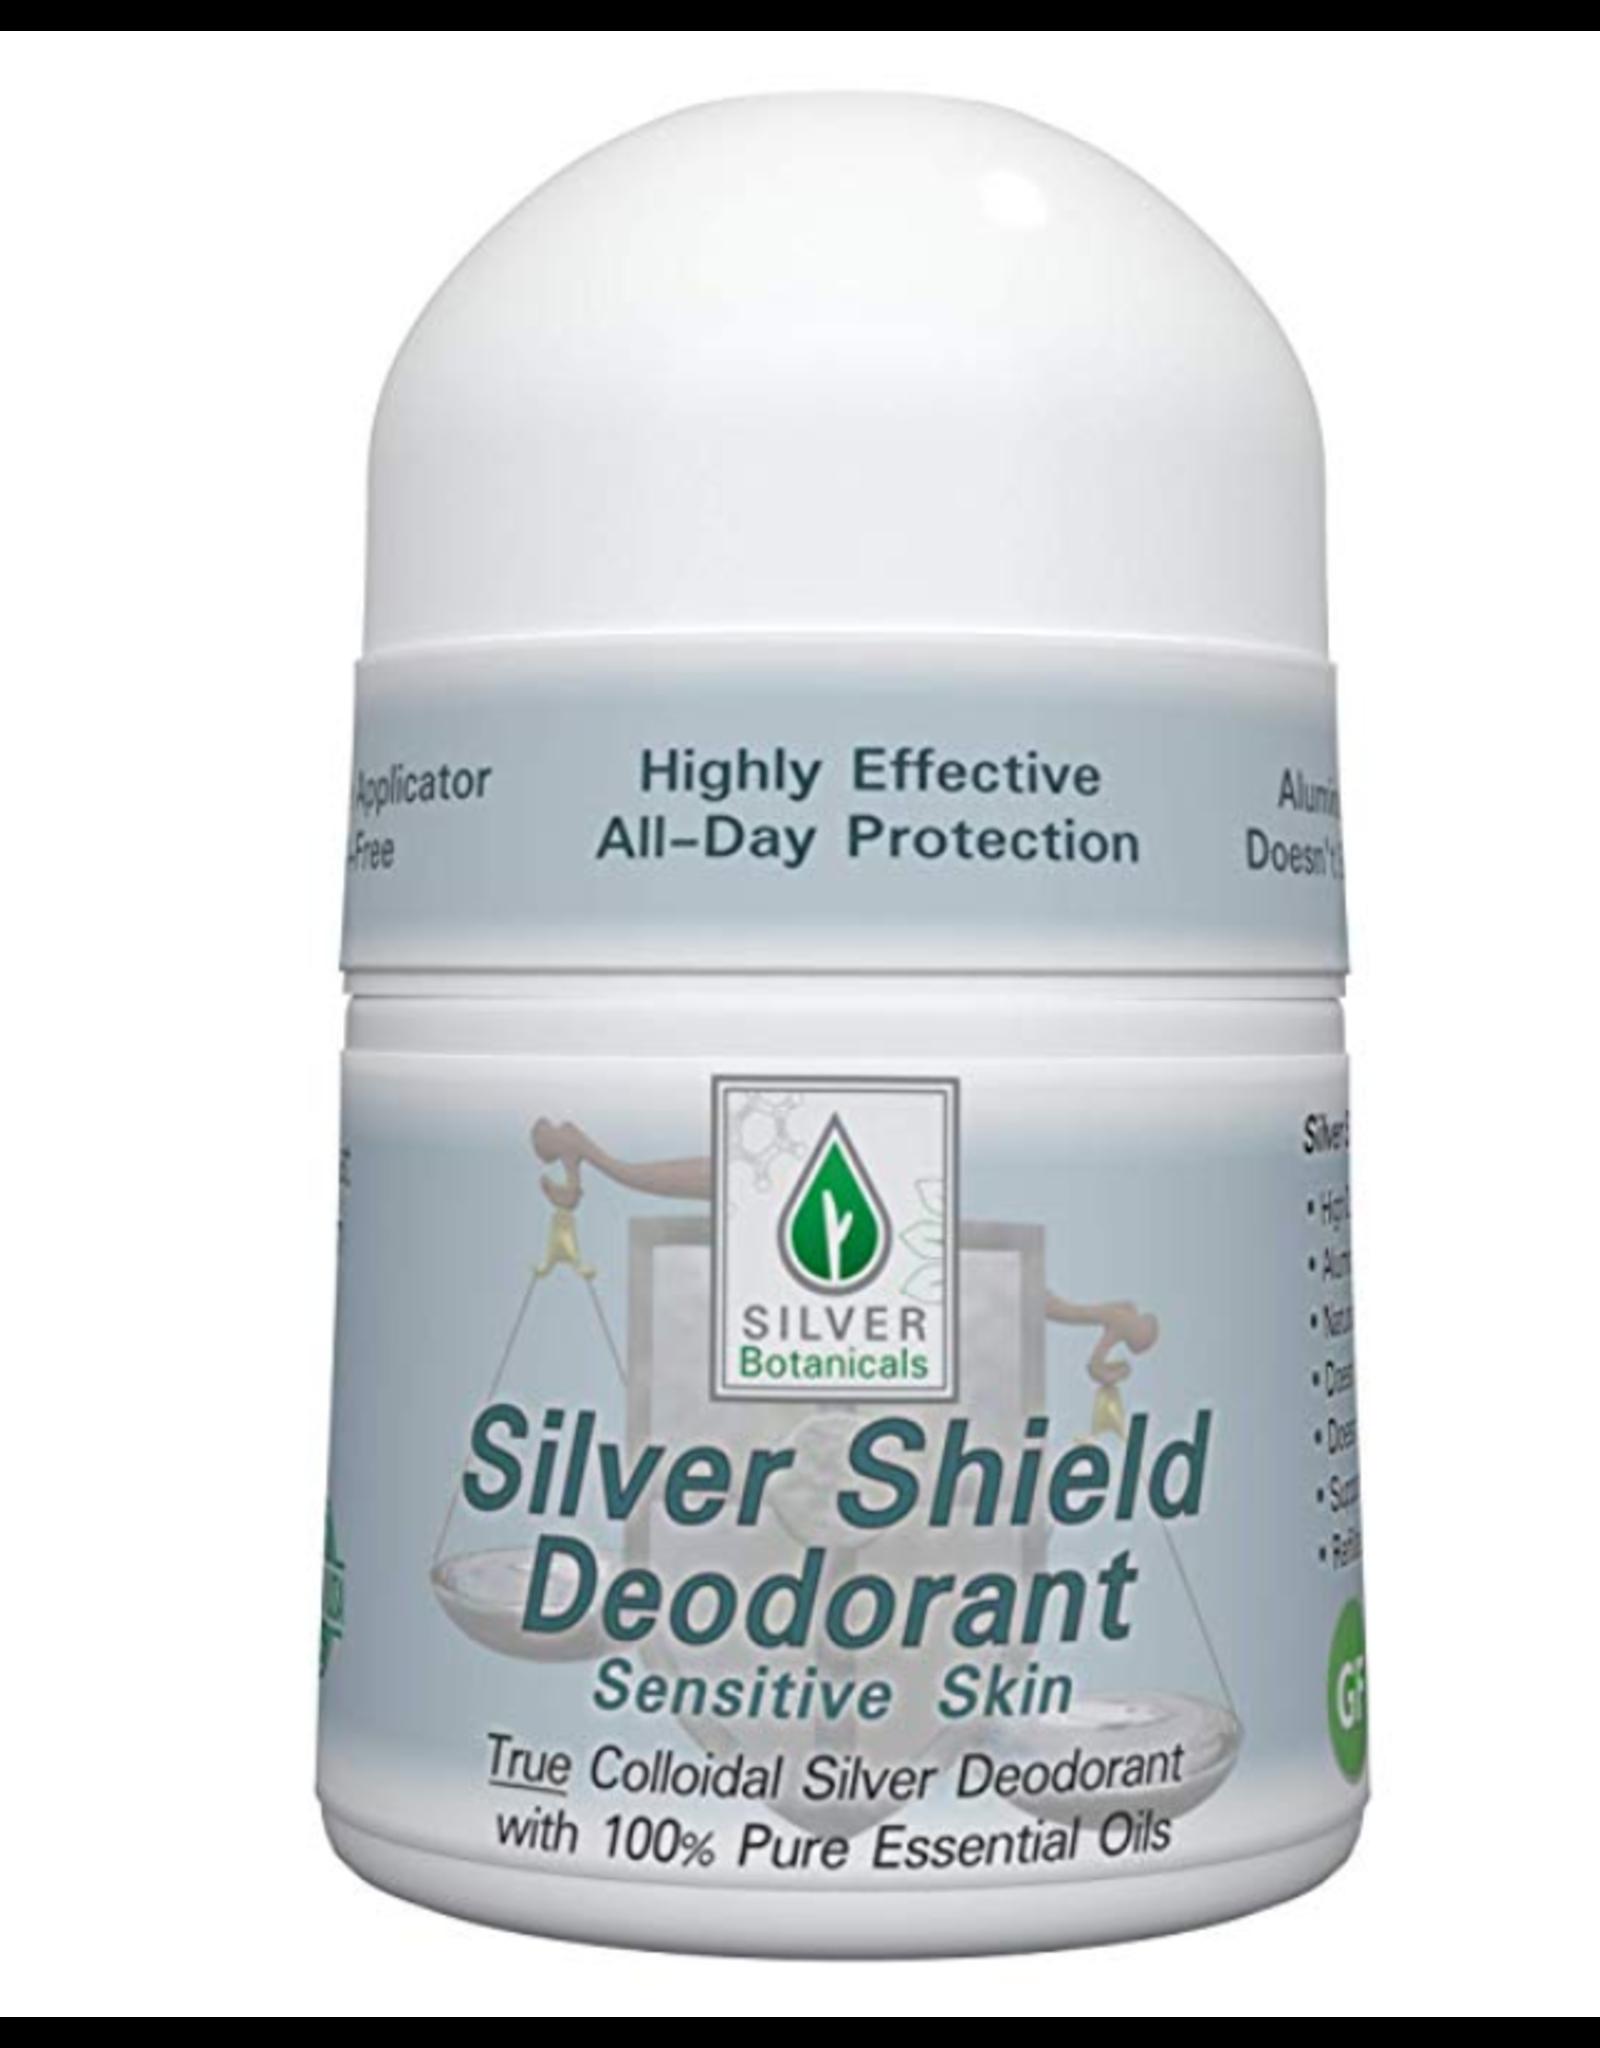 Silver Botanicals Silver Shield Deodorant, Sensitive, Roll On 2oz